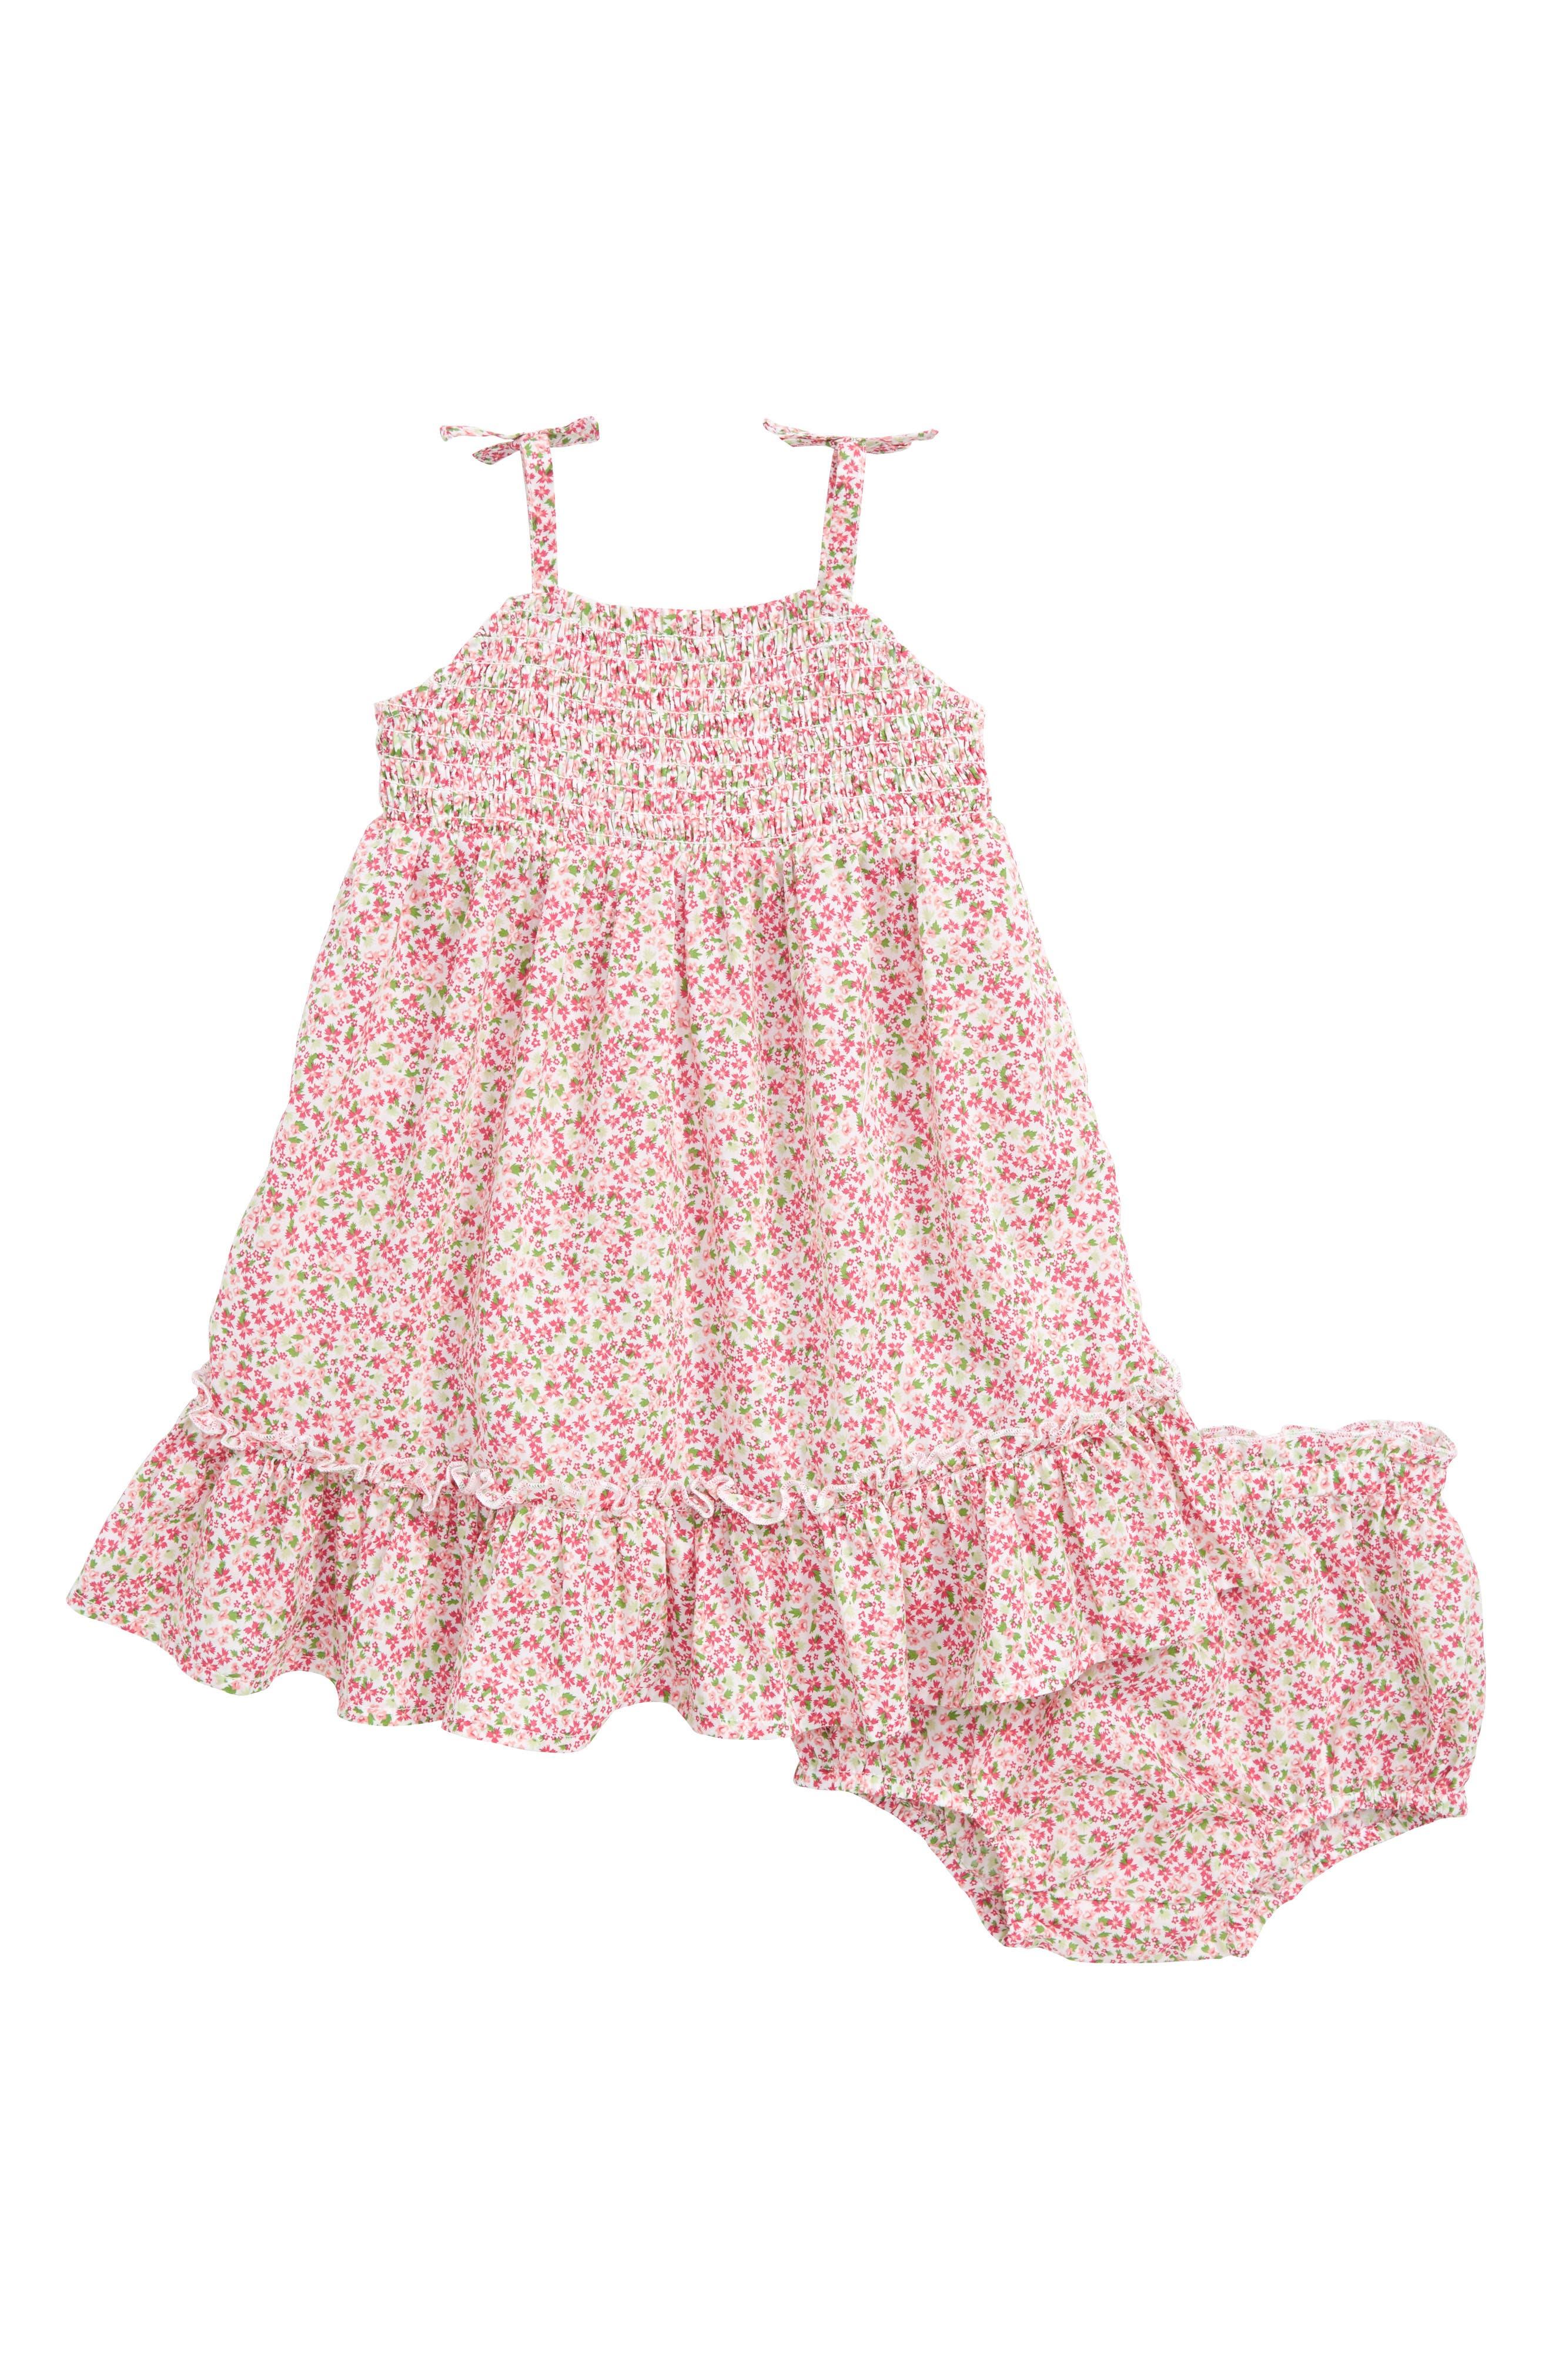 Ditzy Smock Dress,                         Main,                         color, 100